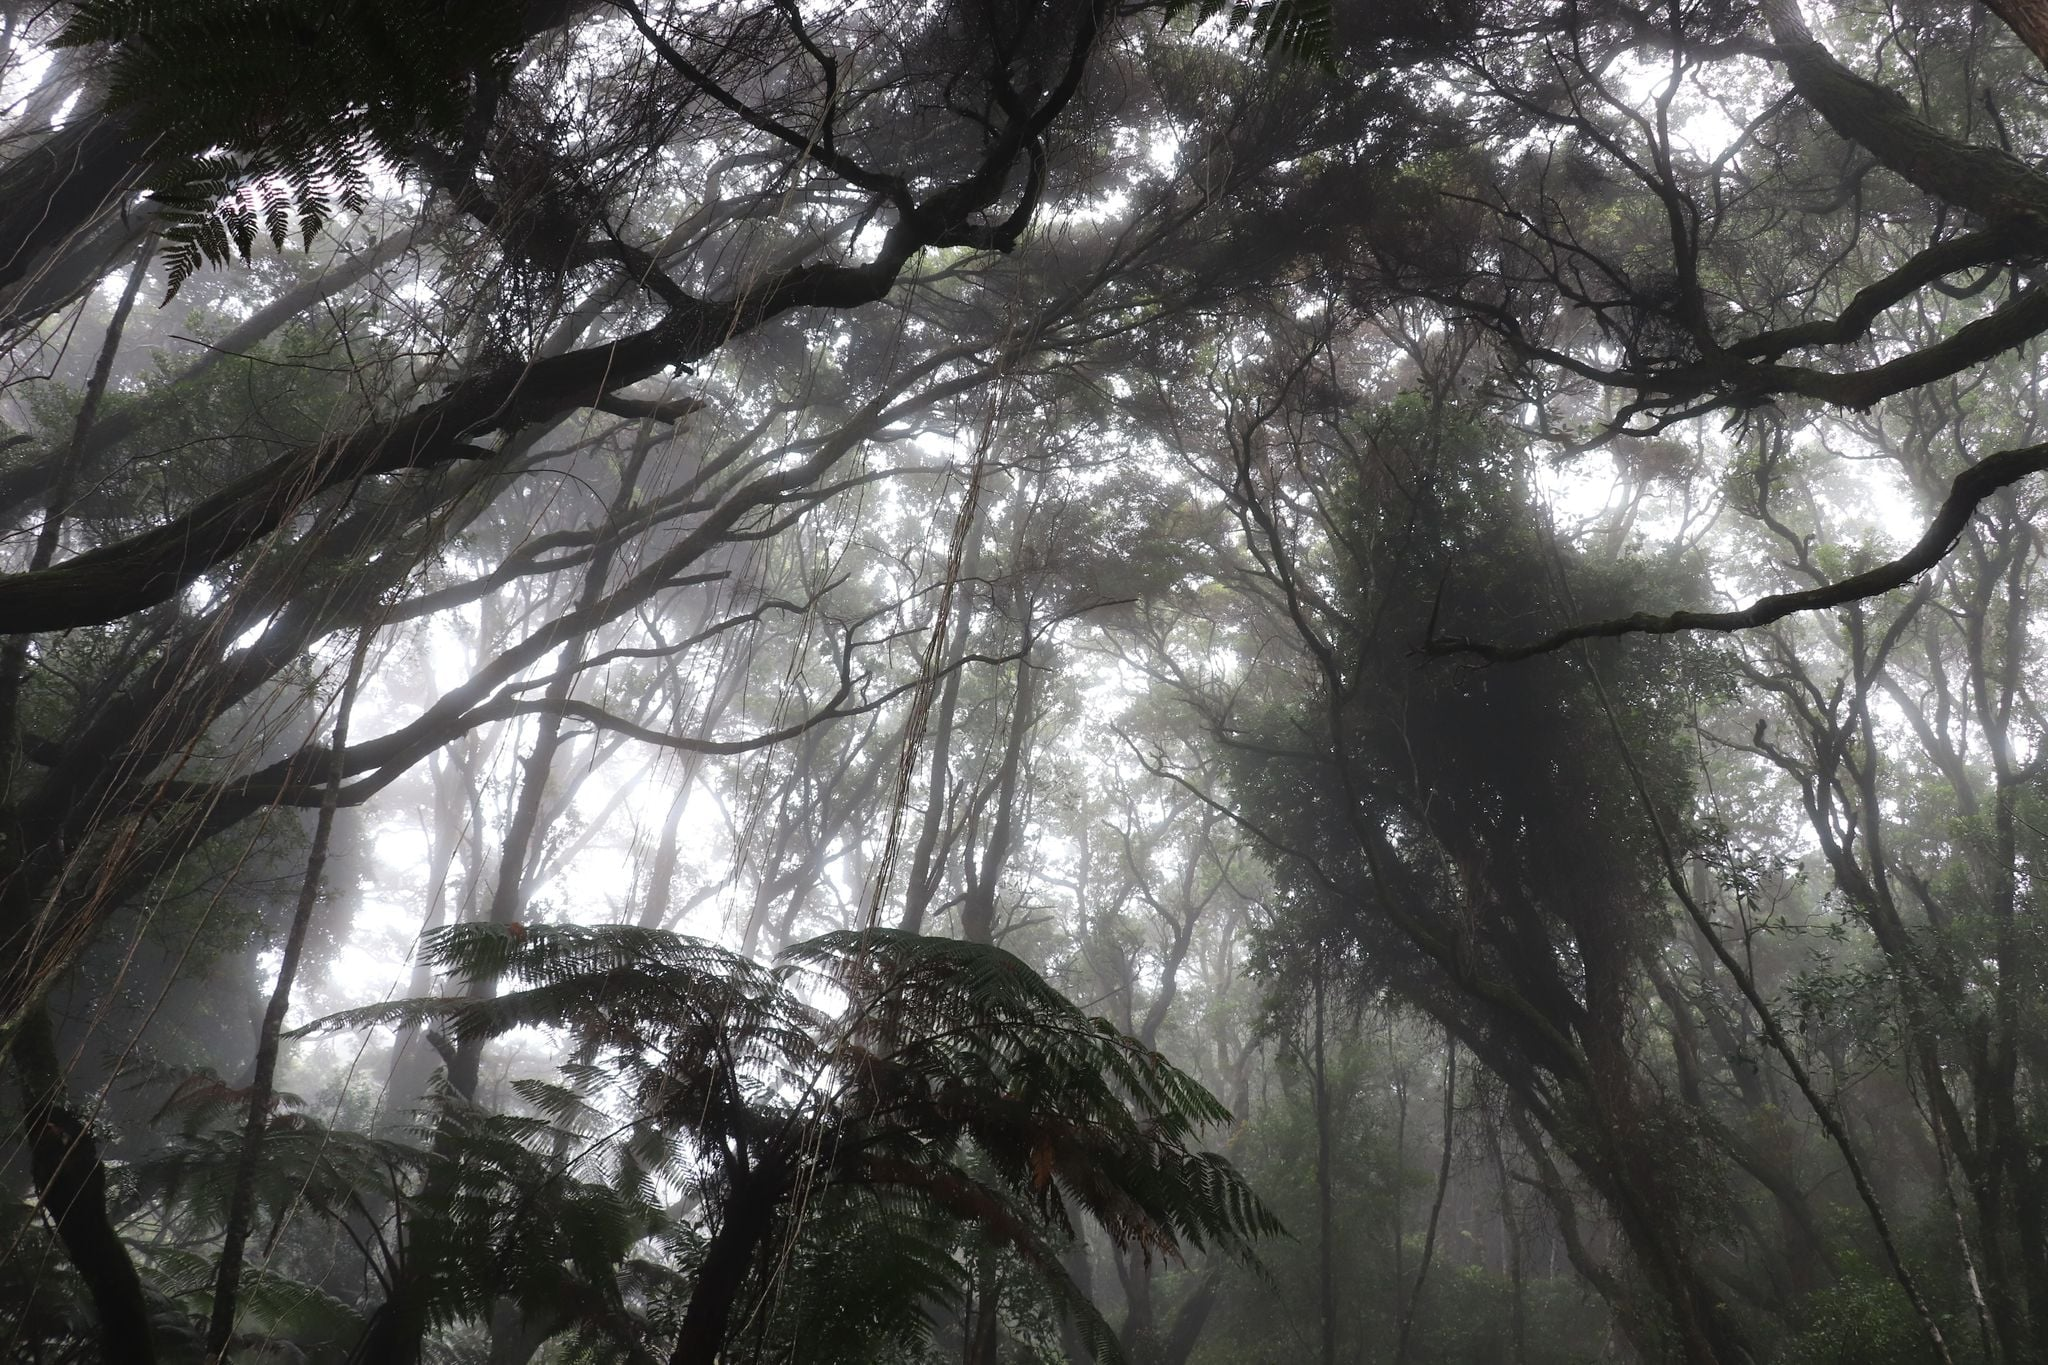 Hiking Mt. Apo - lush vegetation along Mount Apo trails